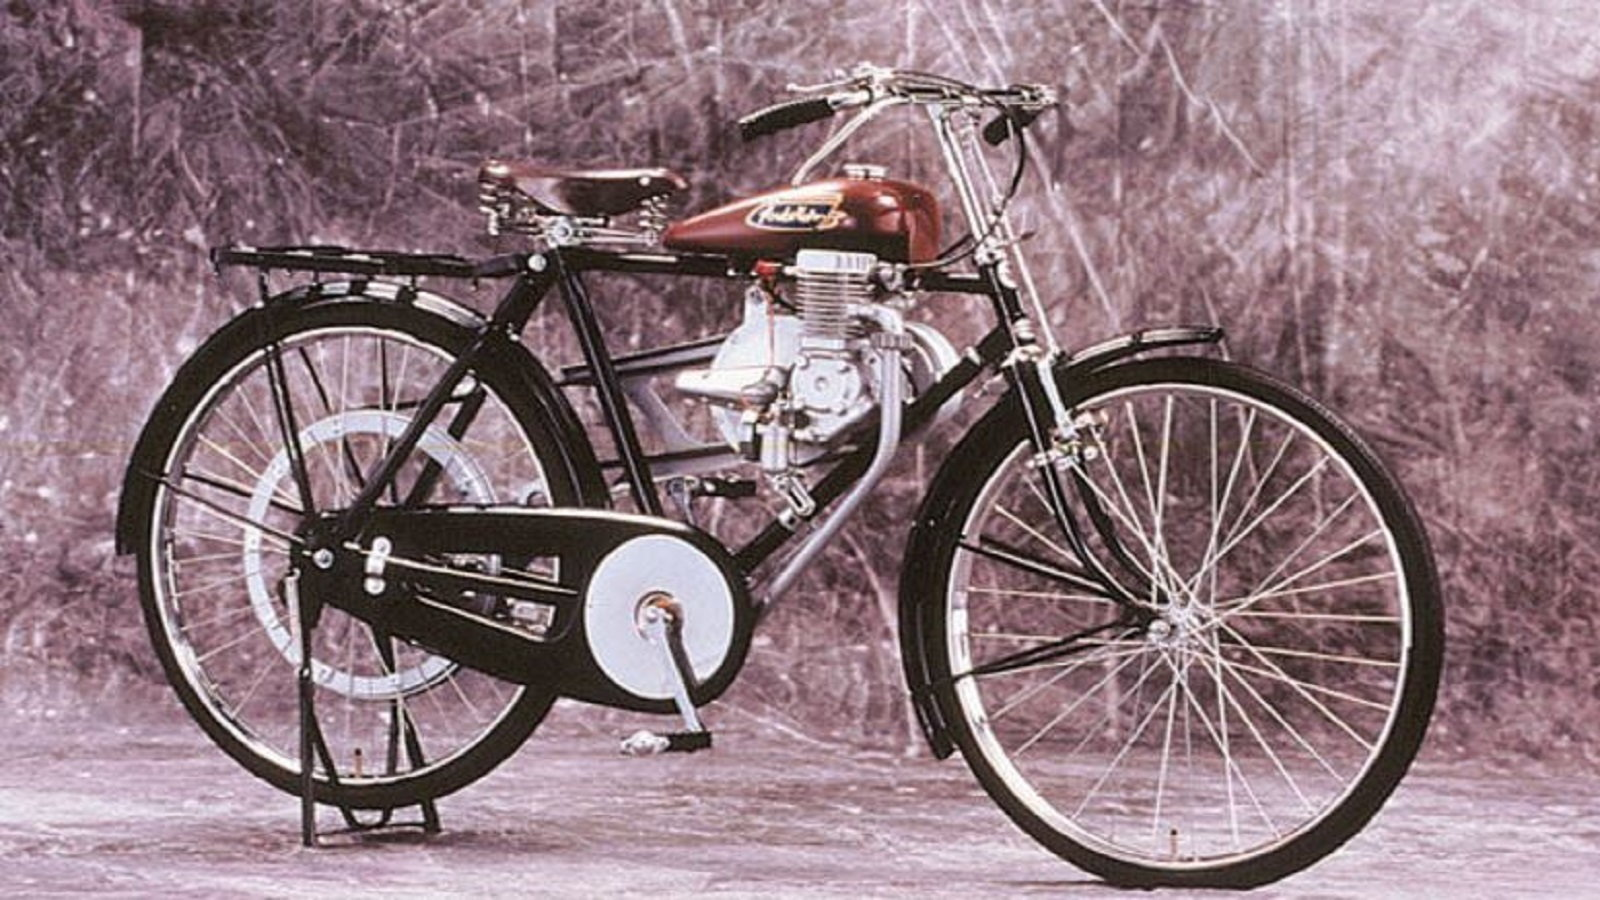 1947 A-Type Bike Motor